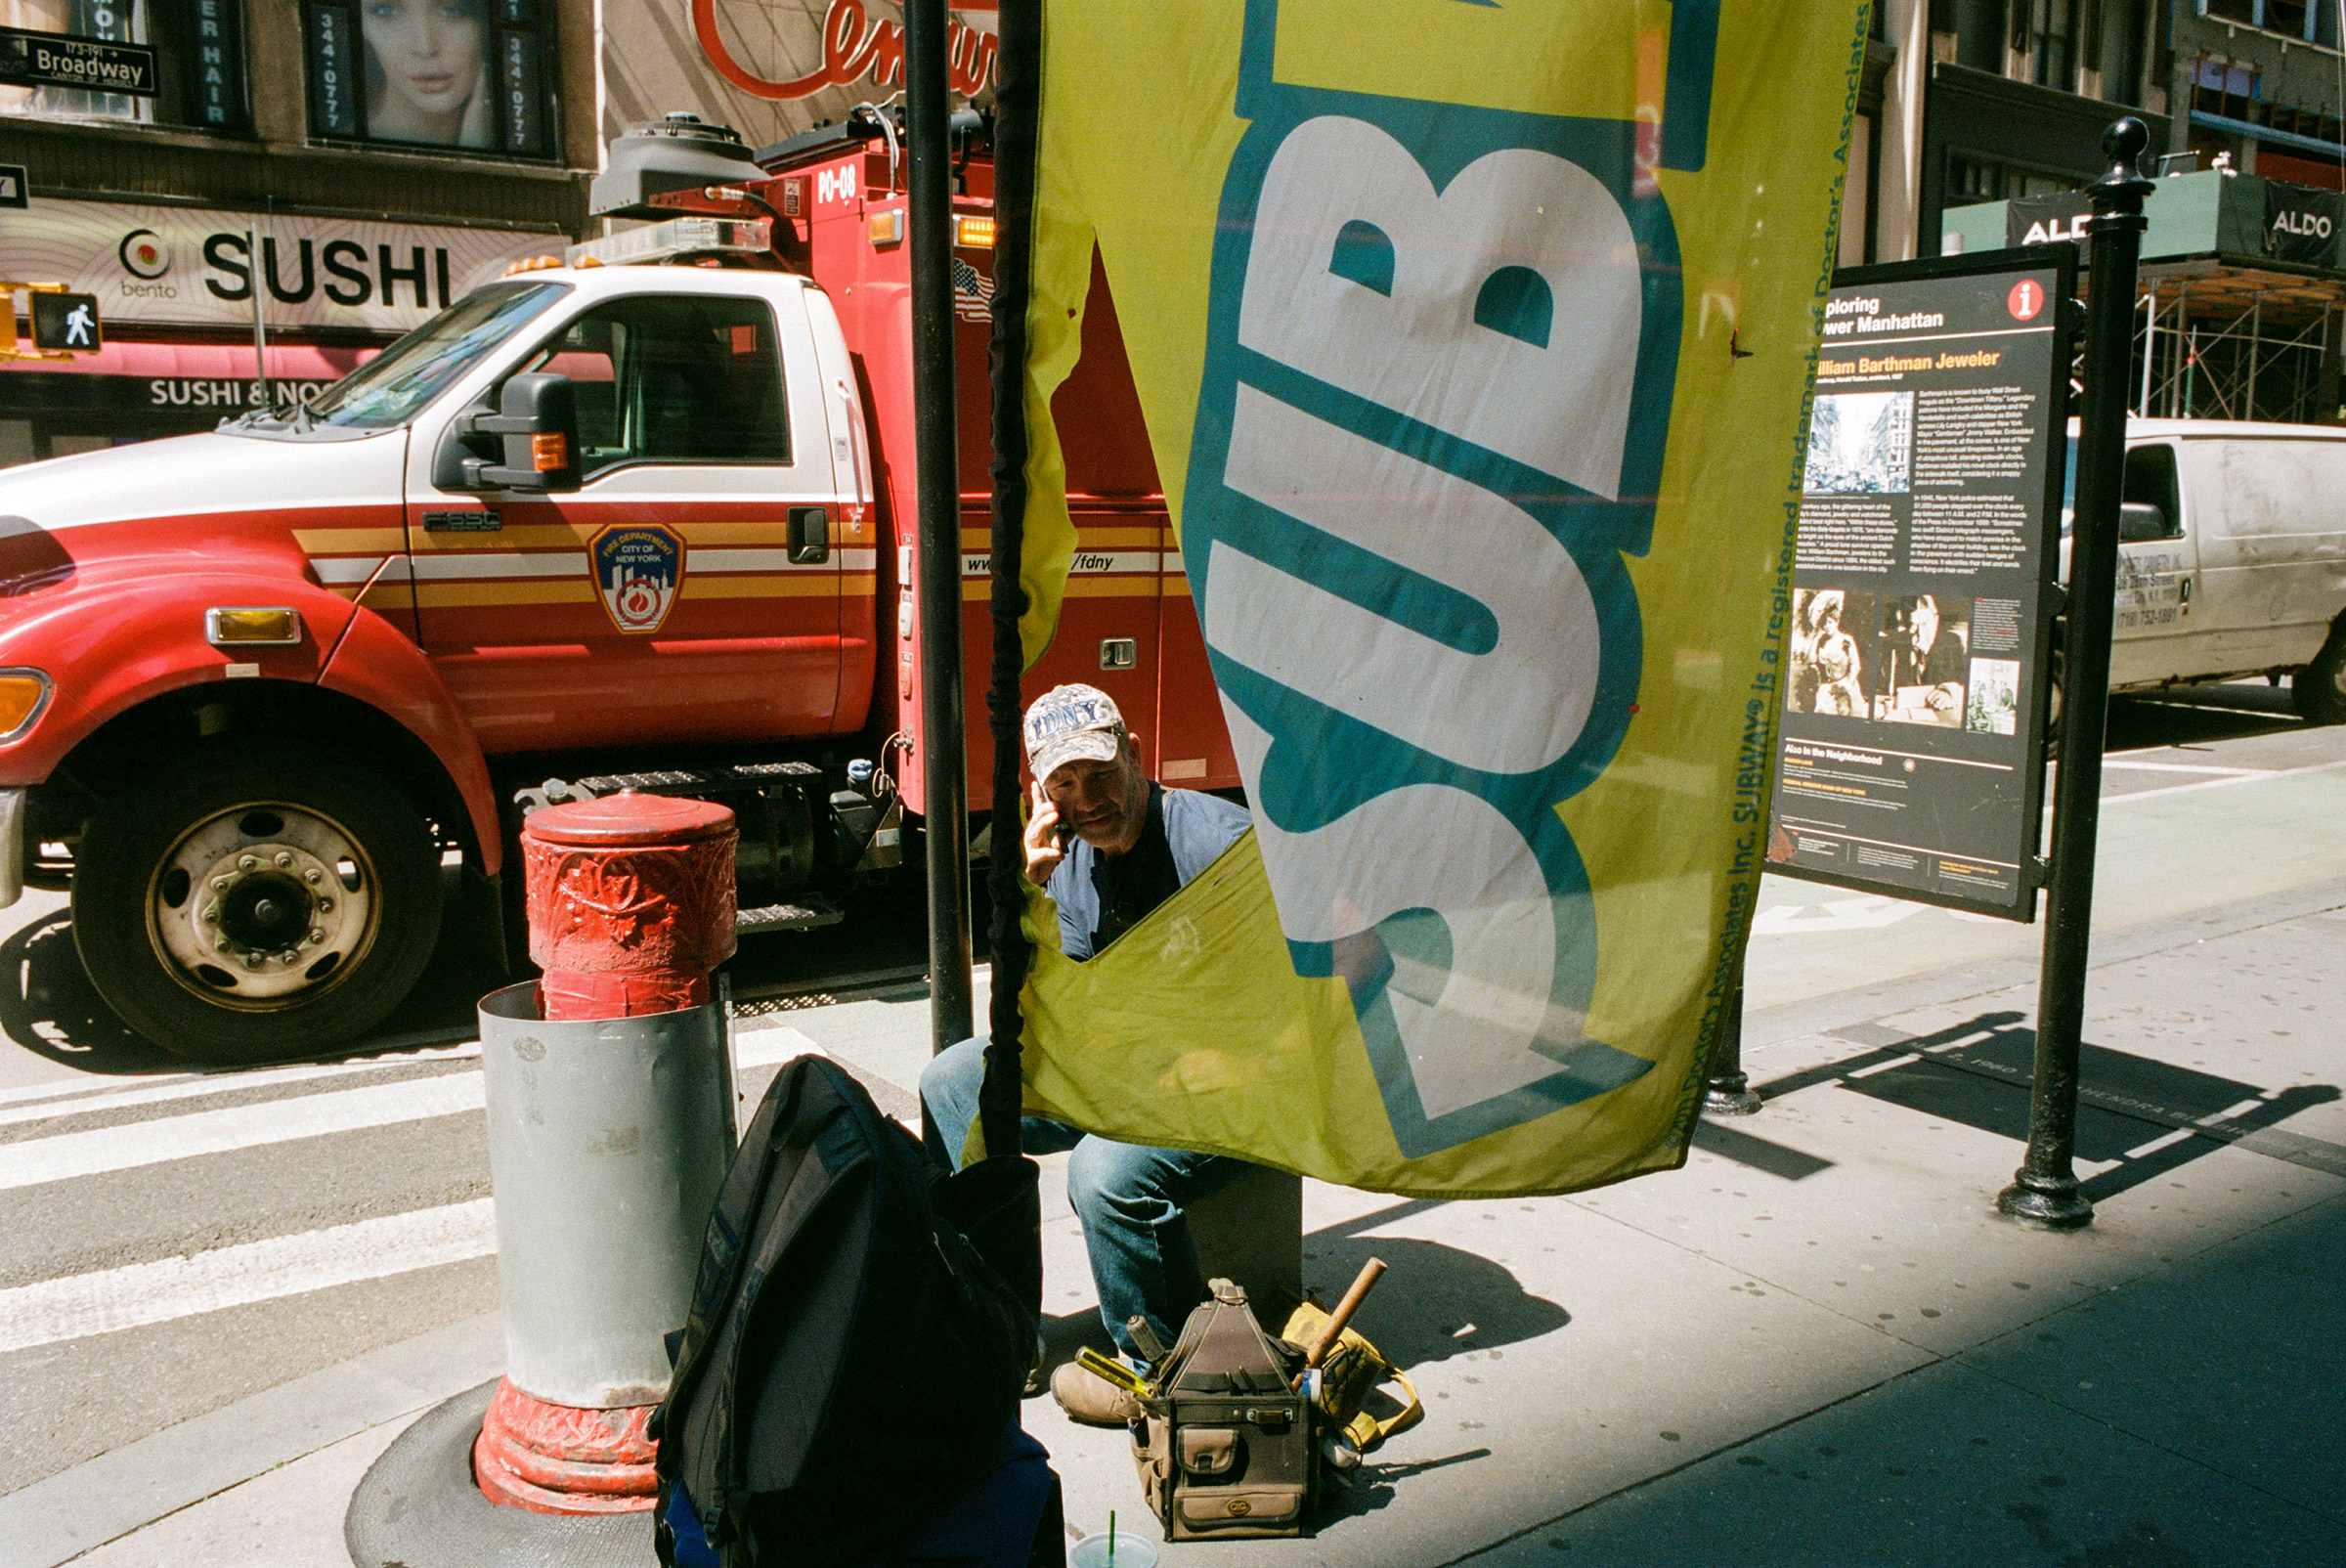 An FDNY repairman takes a break on lower Broadway, Aug. 25, 2021.